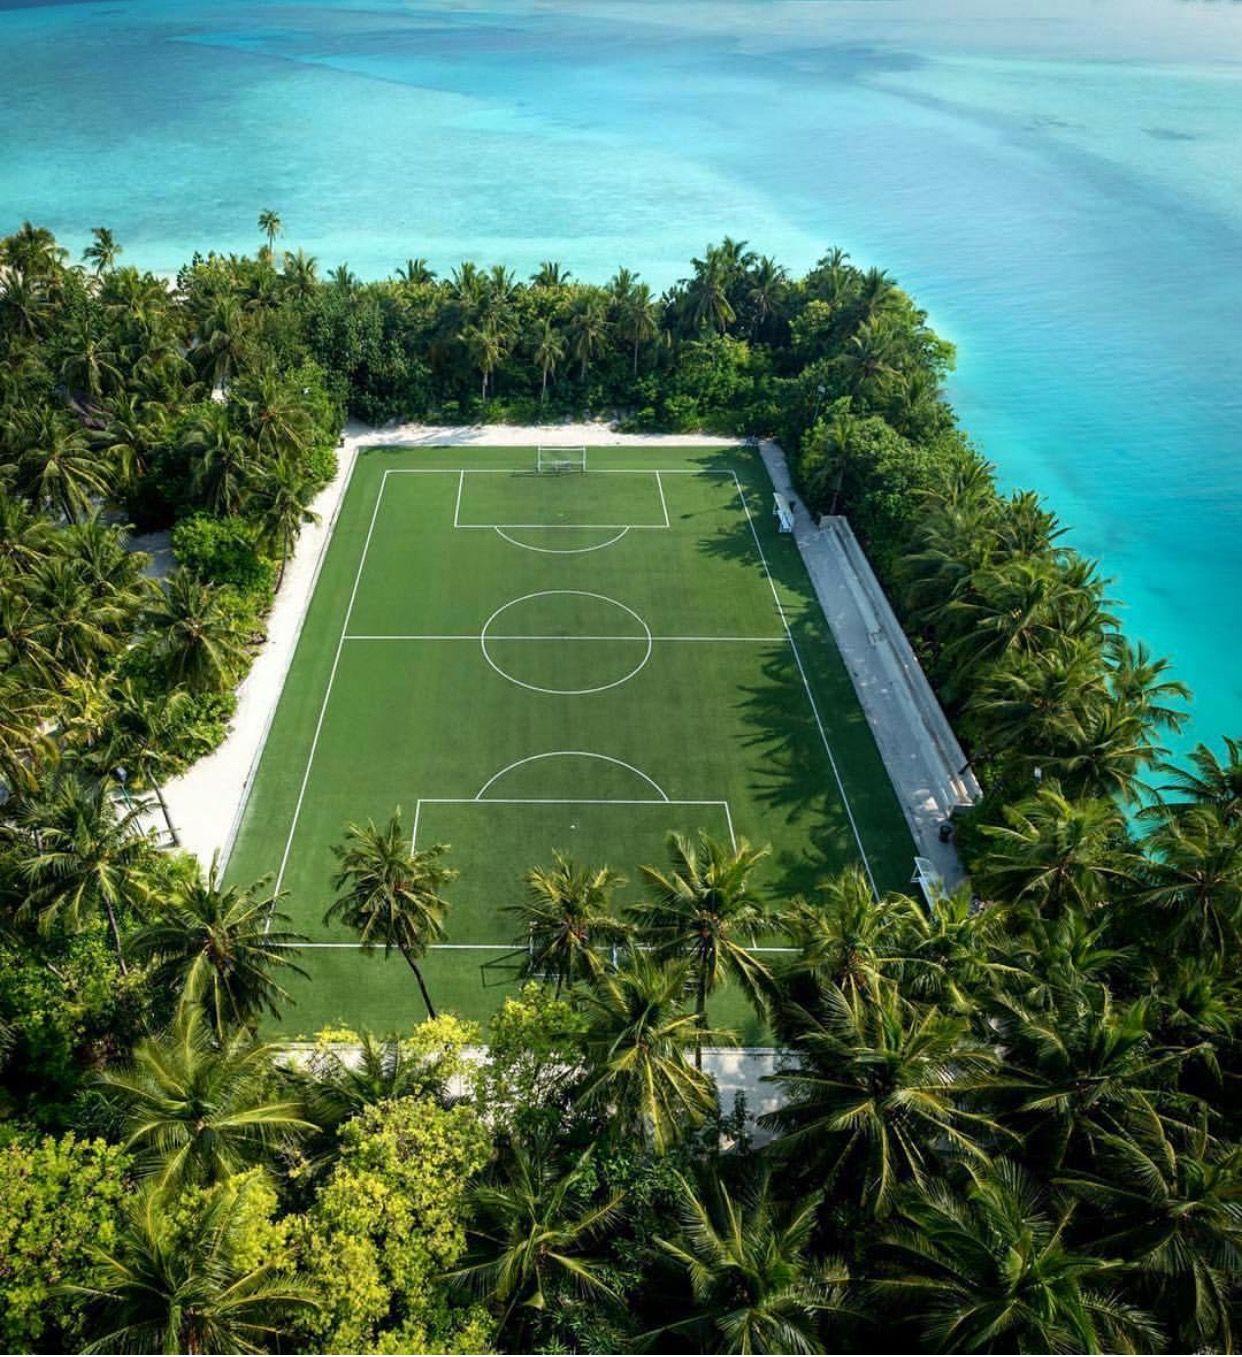 Maldives Gentlemanblogger Www Ge Intl Com Fondos De Pantalla Deportes Fondo De Pantalla Futbol Cancha De Futbol